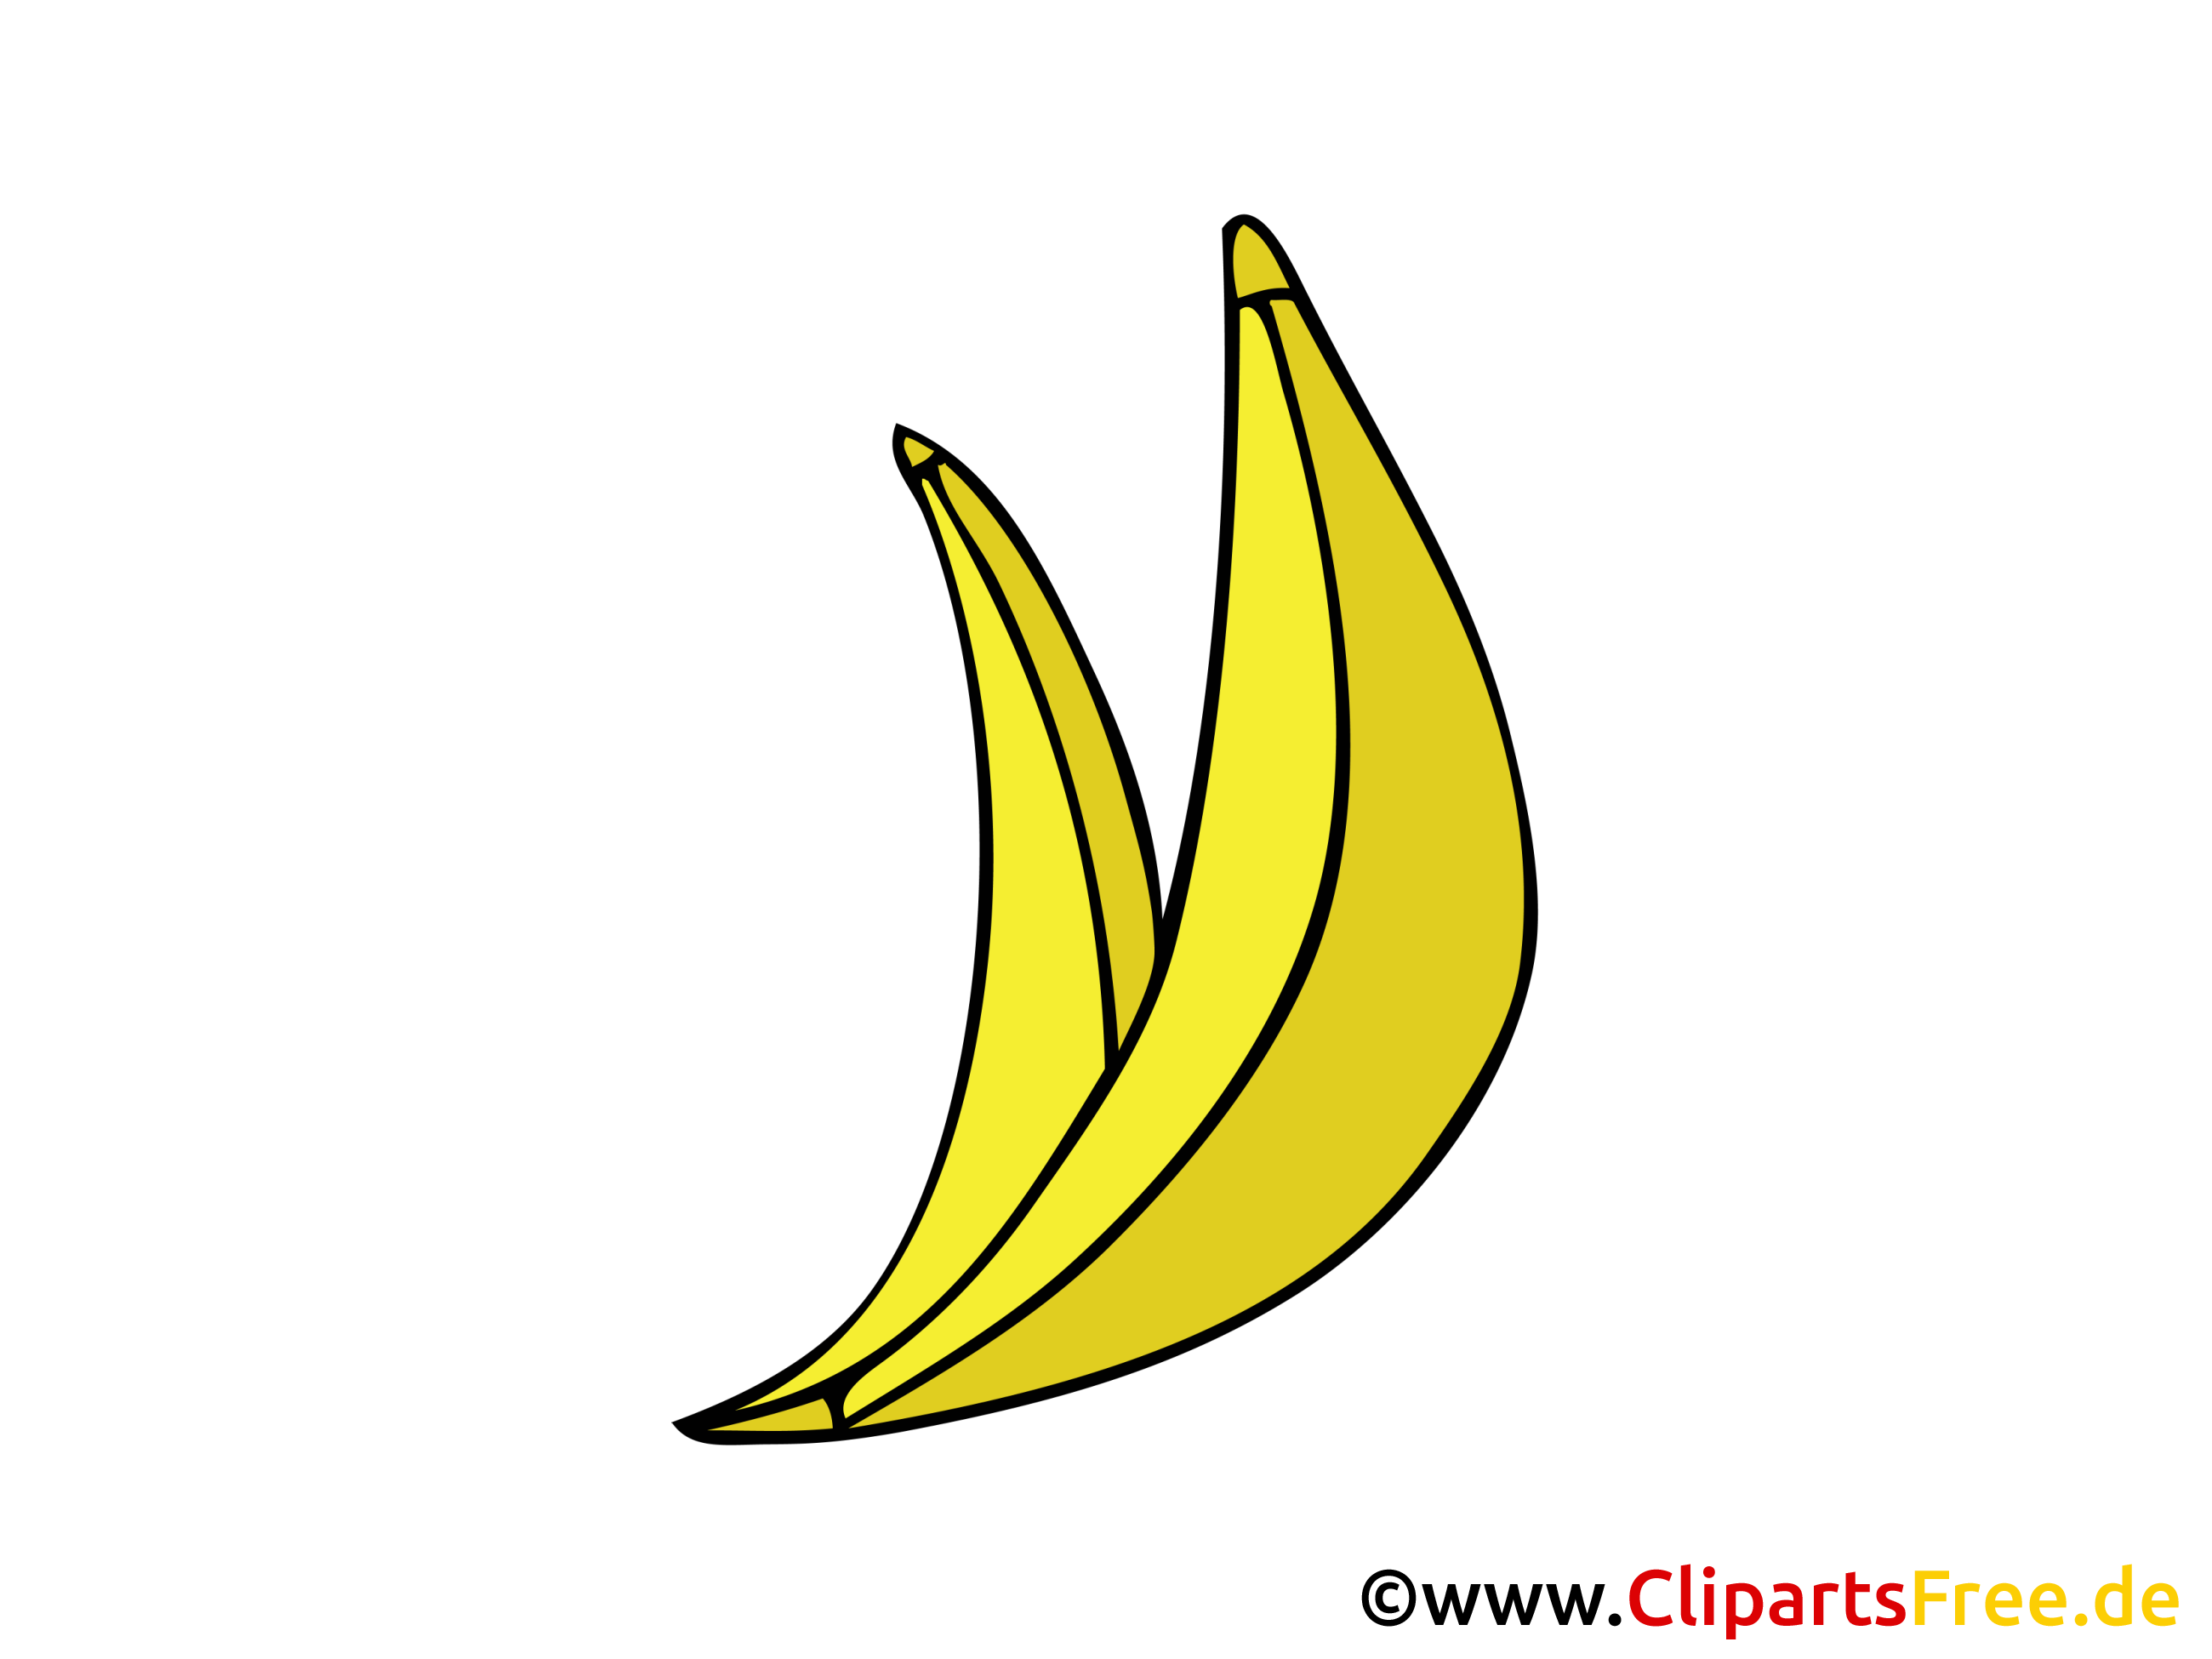 Bananes dessins gratuits - Nourriture clipart